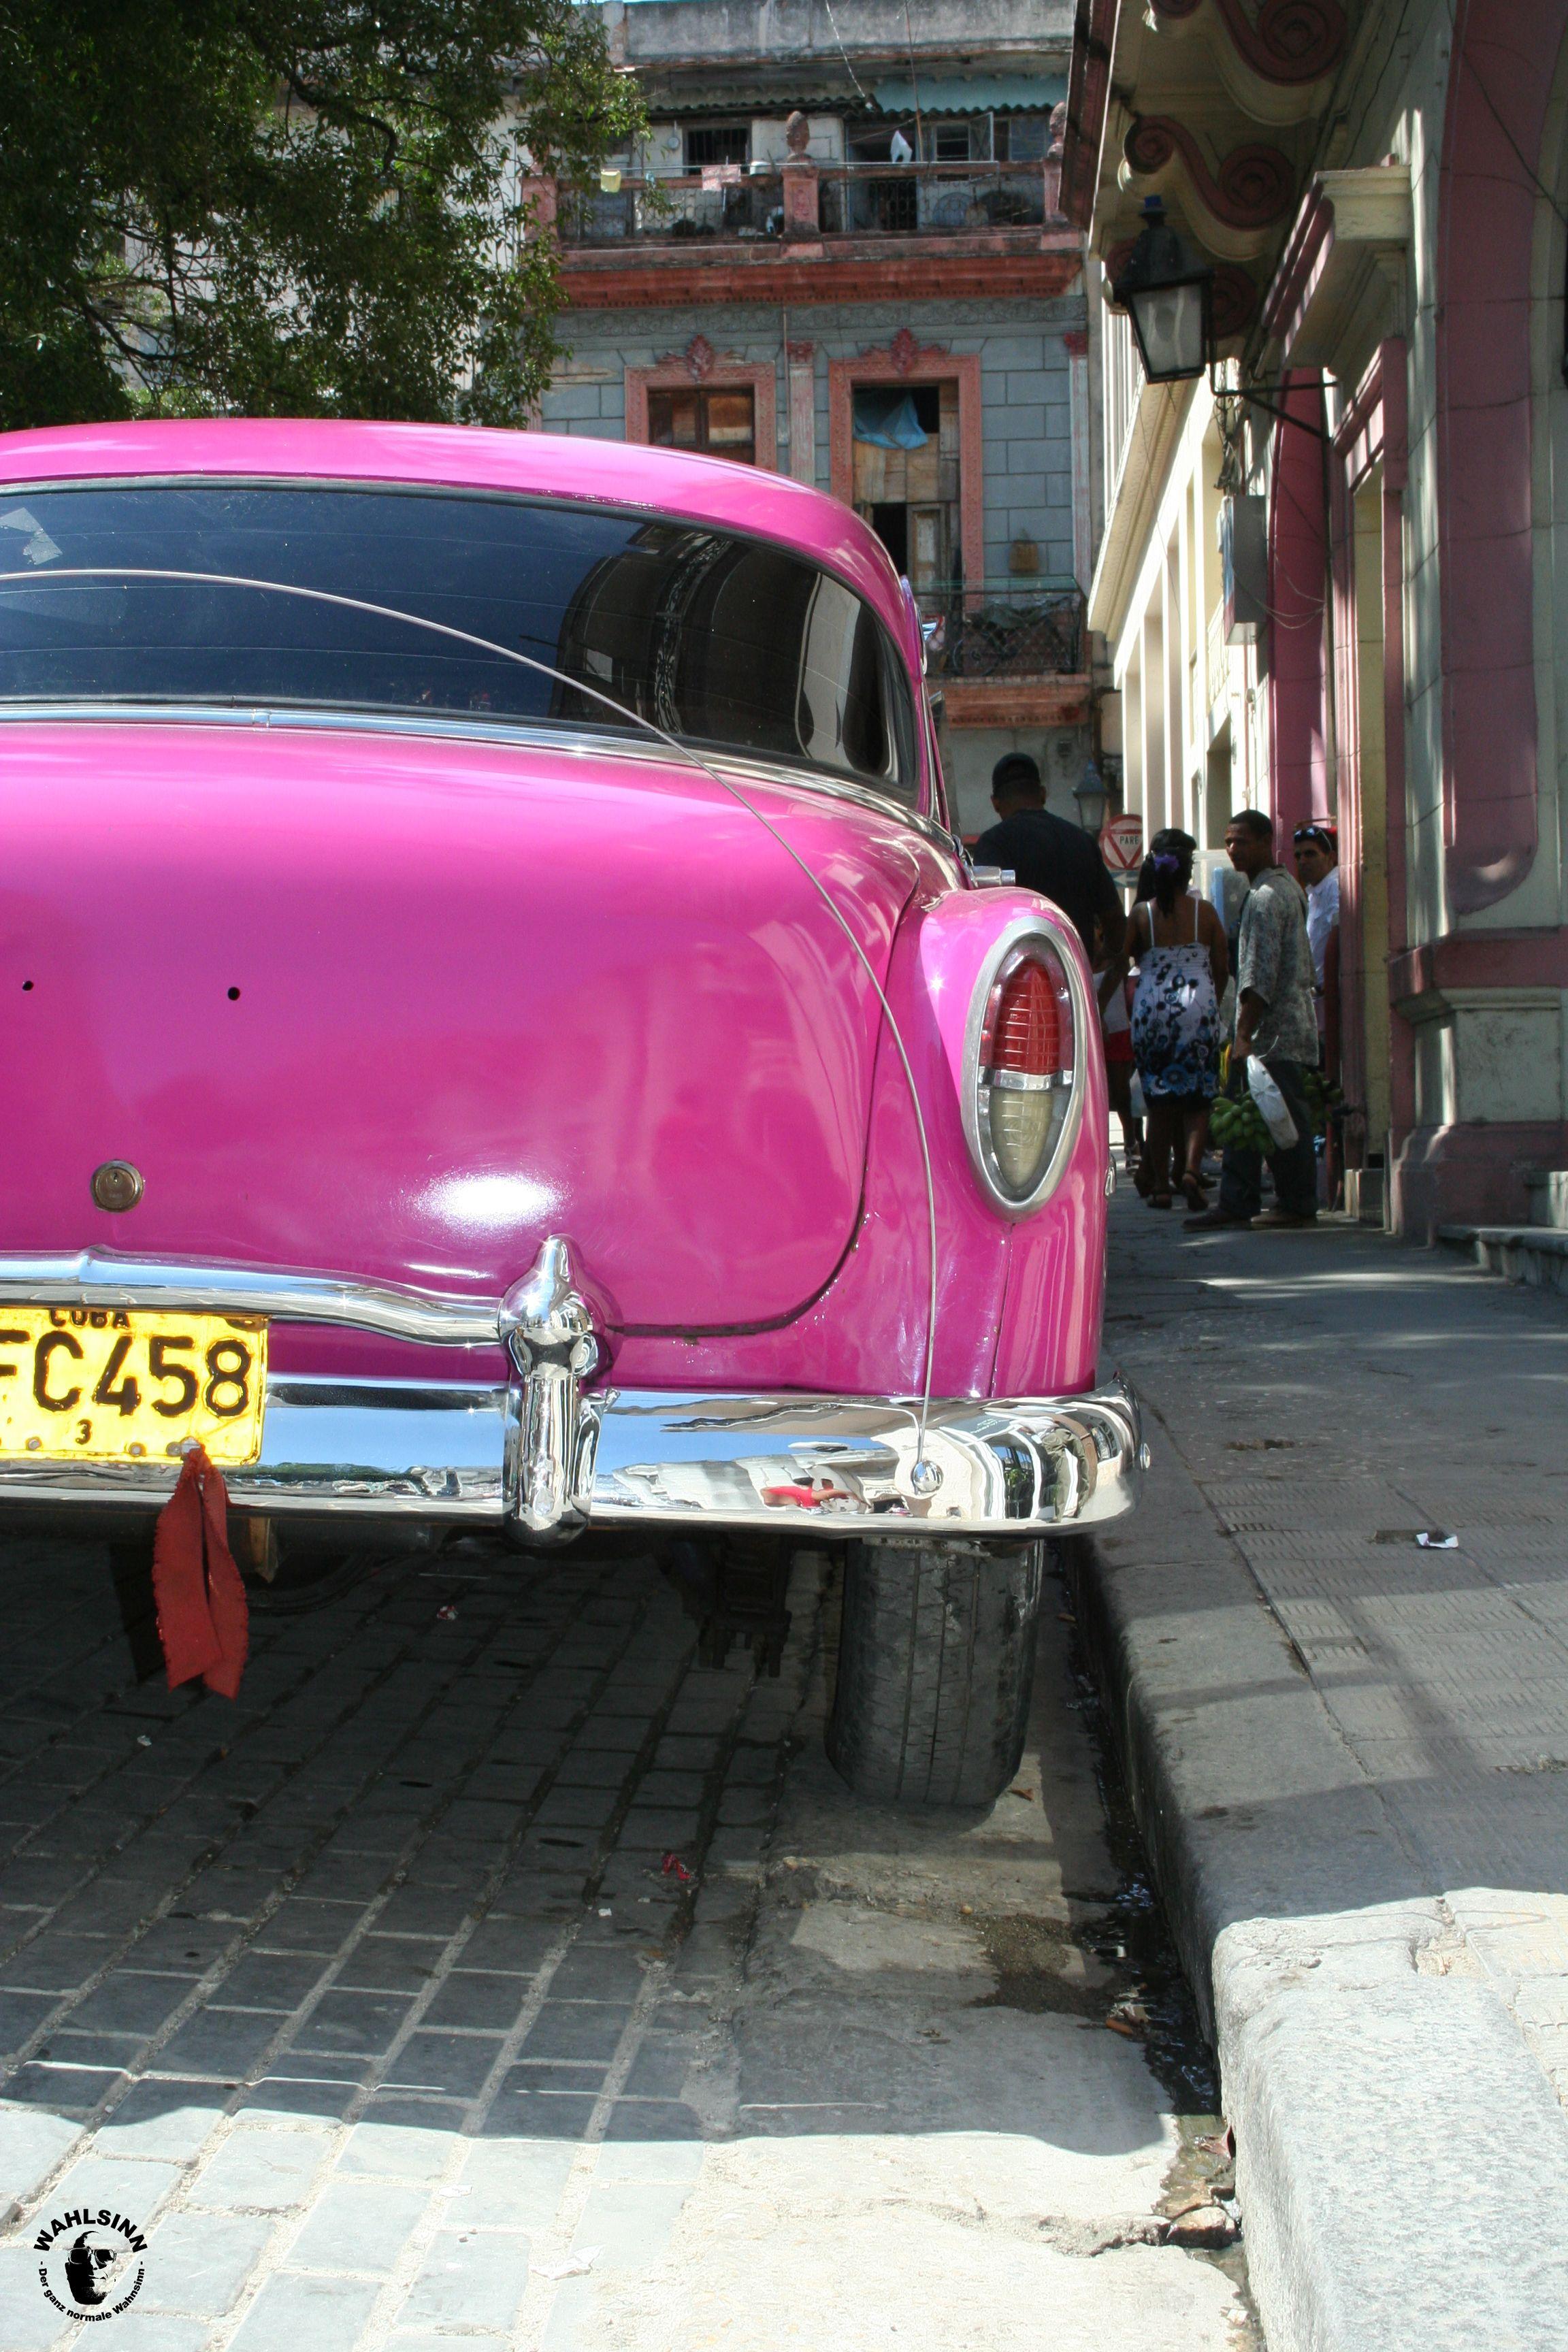 Knallbunte Oldtimer sind keine seltenheit in den Straßen Havannas // Havanna (Kuba)